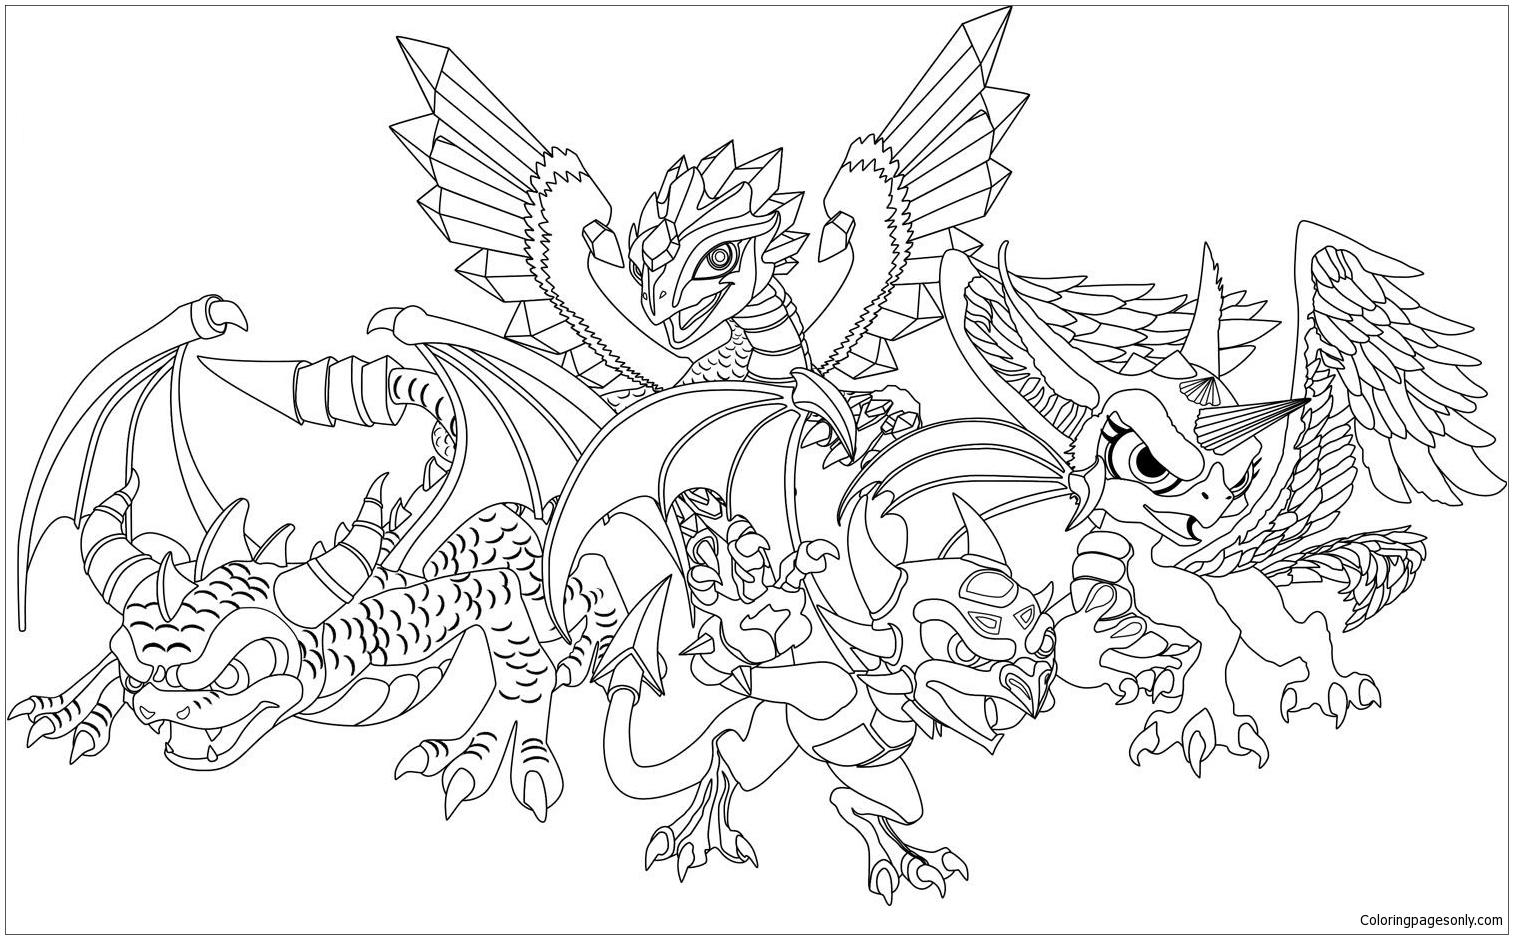 Dessin Skylanders Coloring Page - Free Coloring Pages Online avec Dessin De Skylanders